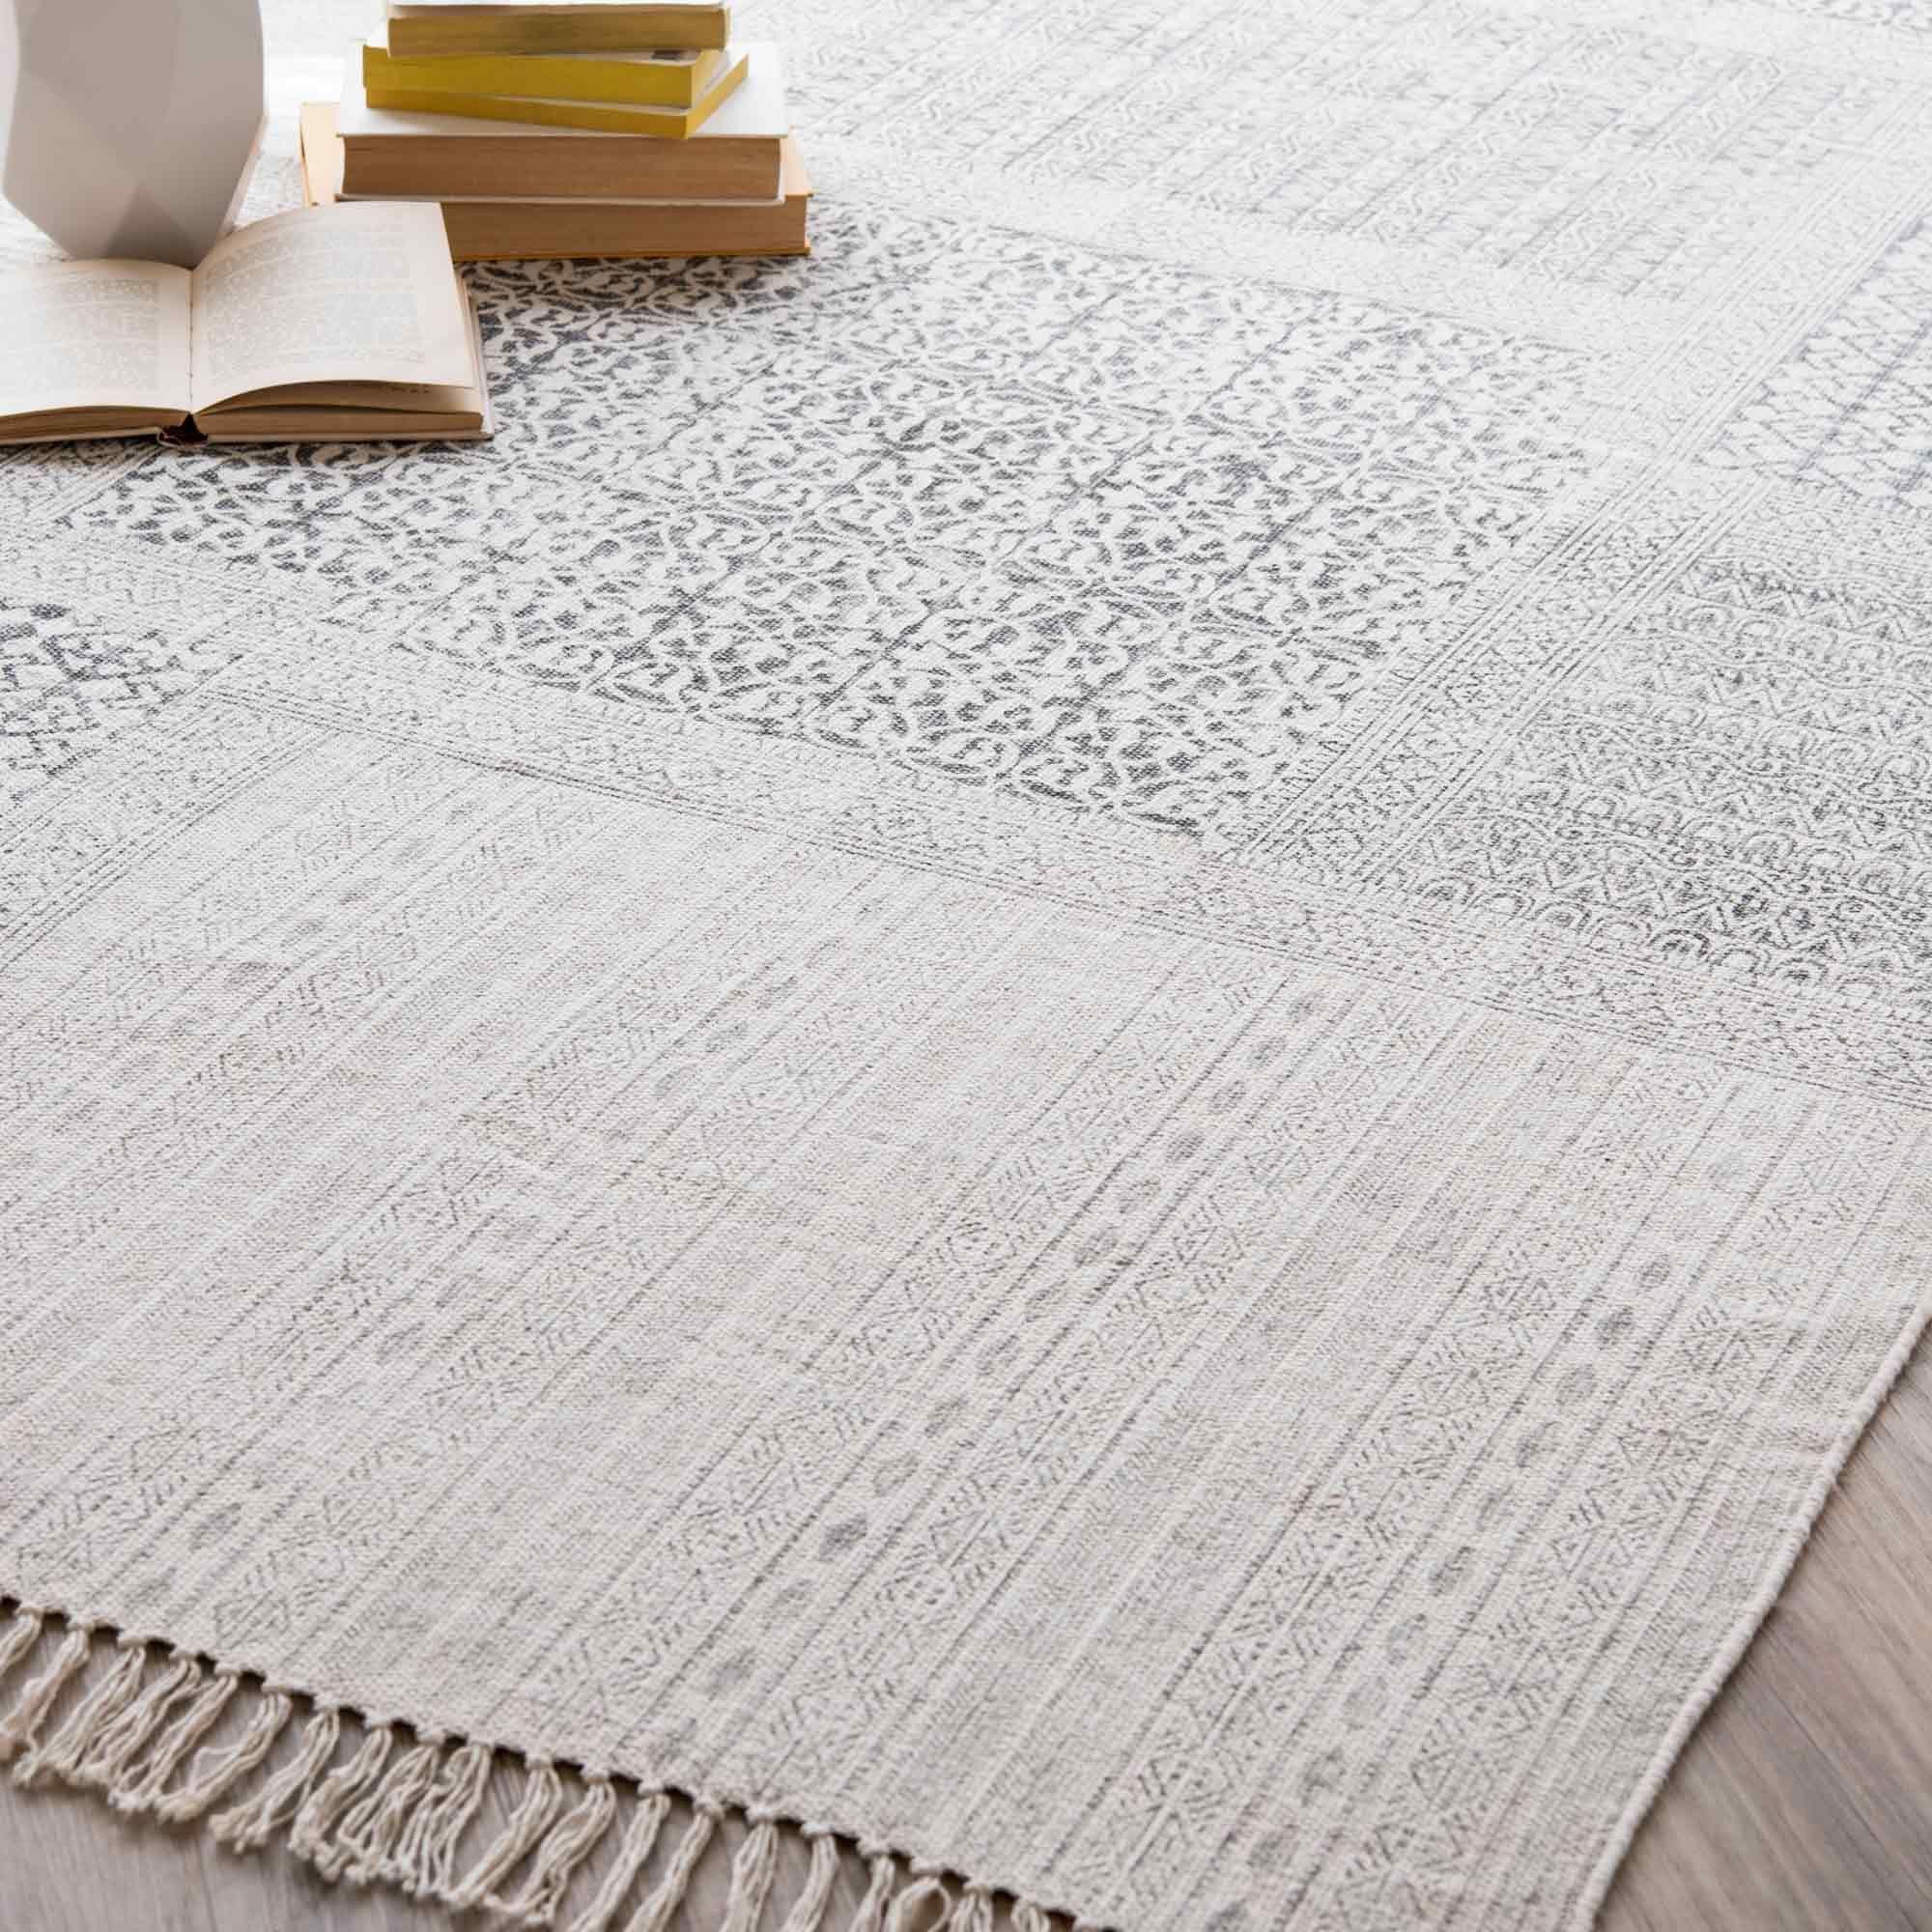 Teppich aus Baumwolle, 140 x 200 cm, CODOSERA | SHOP THE LOOK | MY ...